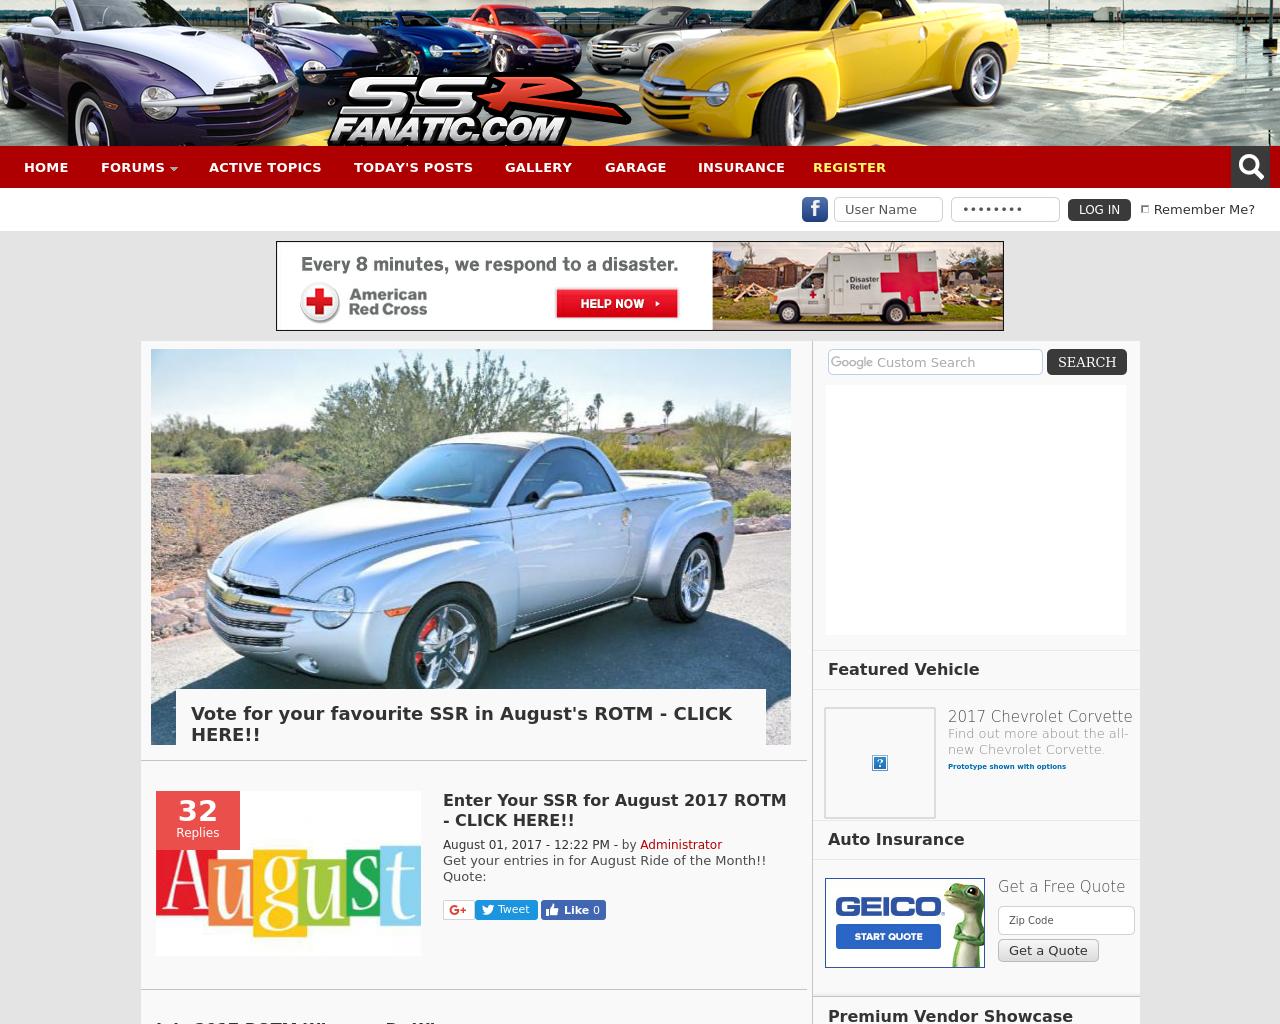 SSR-Fanatic.com-Advertising-Reviews-Pricing